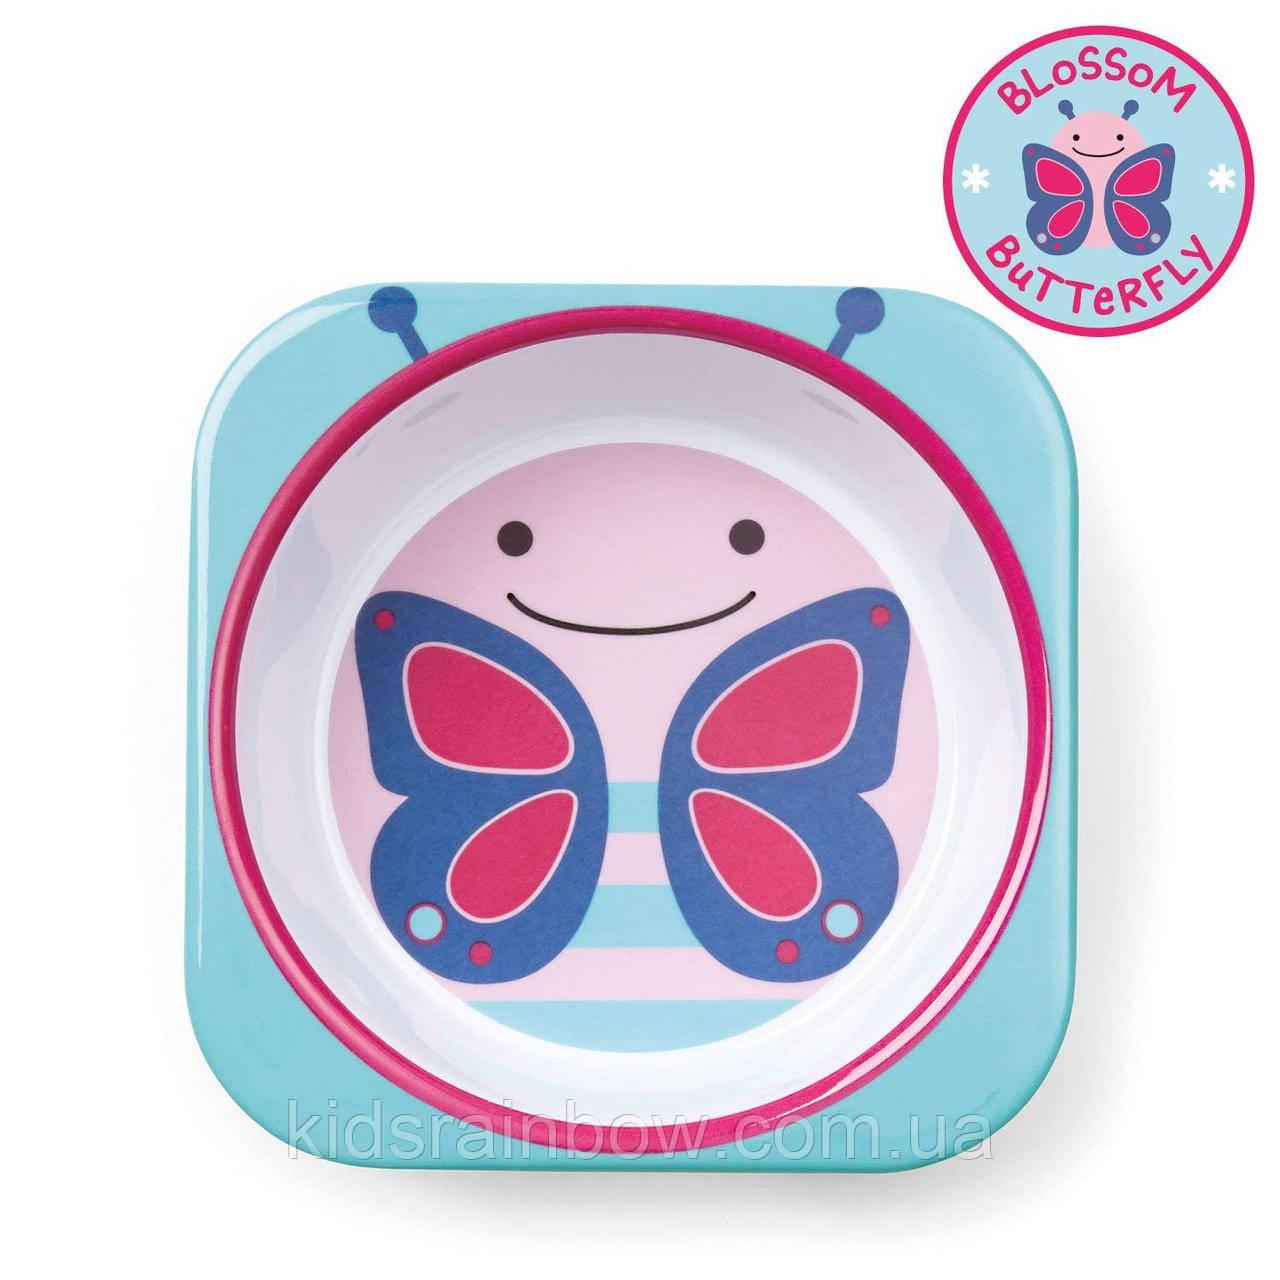 Детская глубокая тарелочка Skip Hop Бабочка